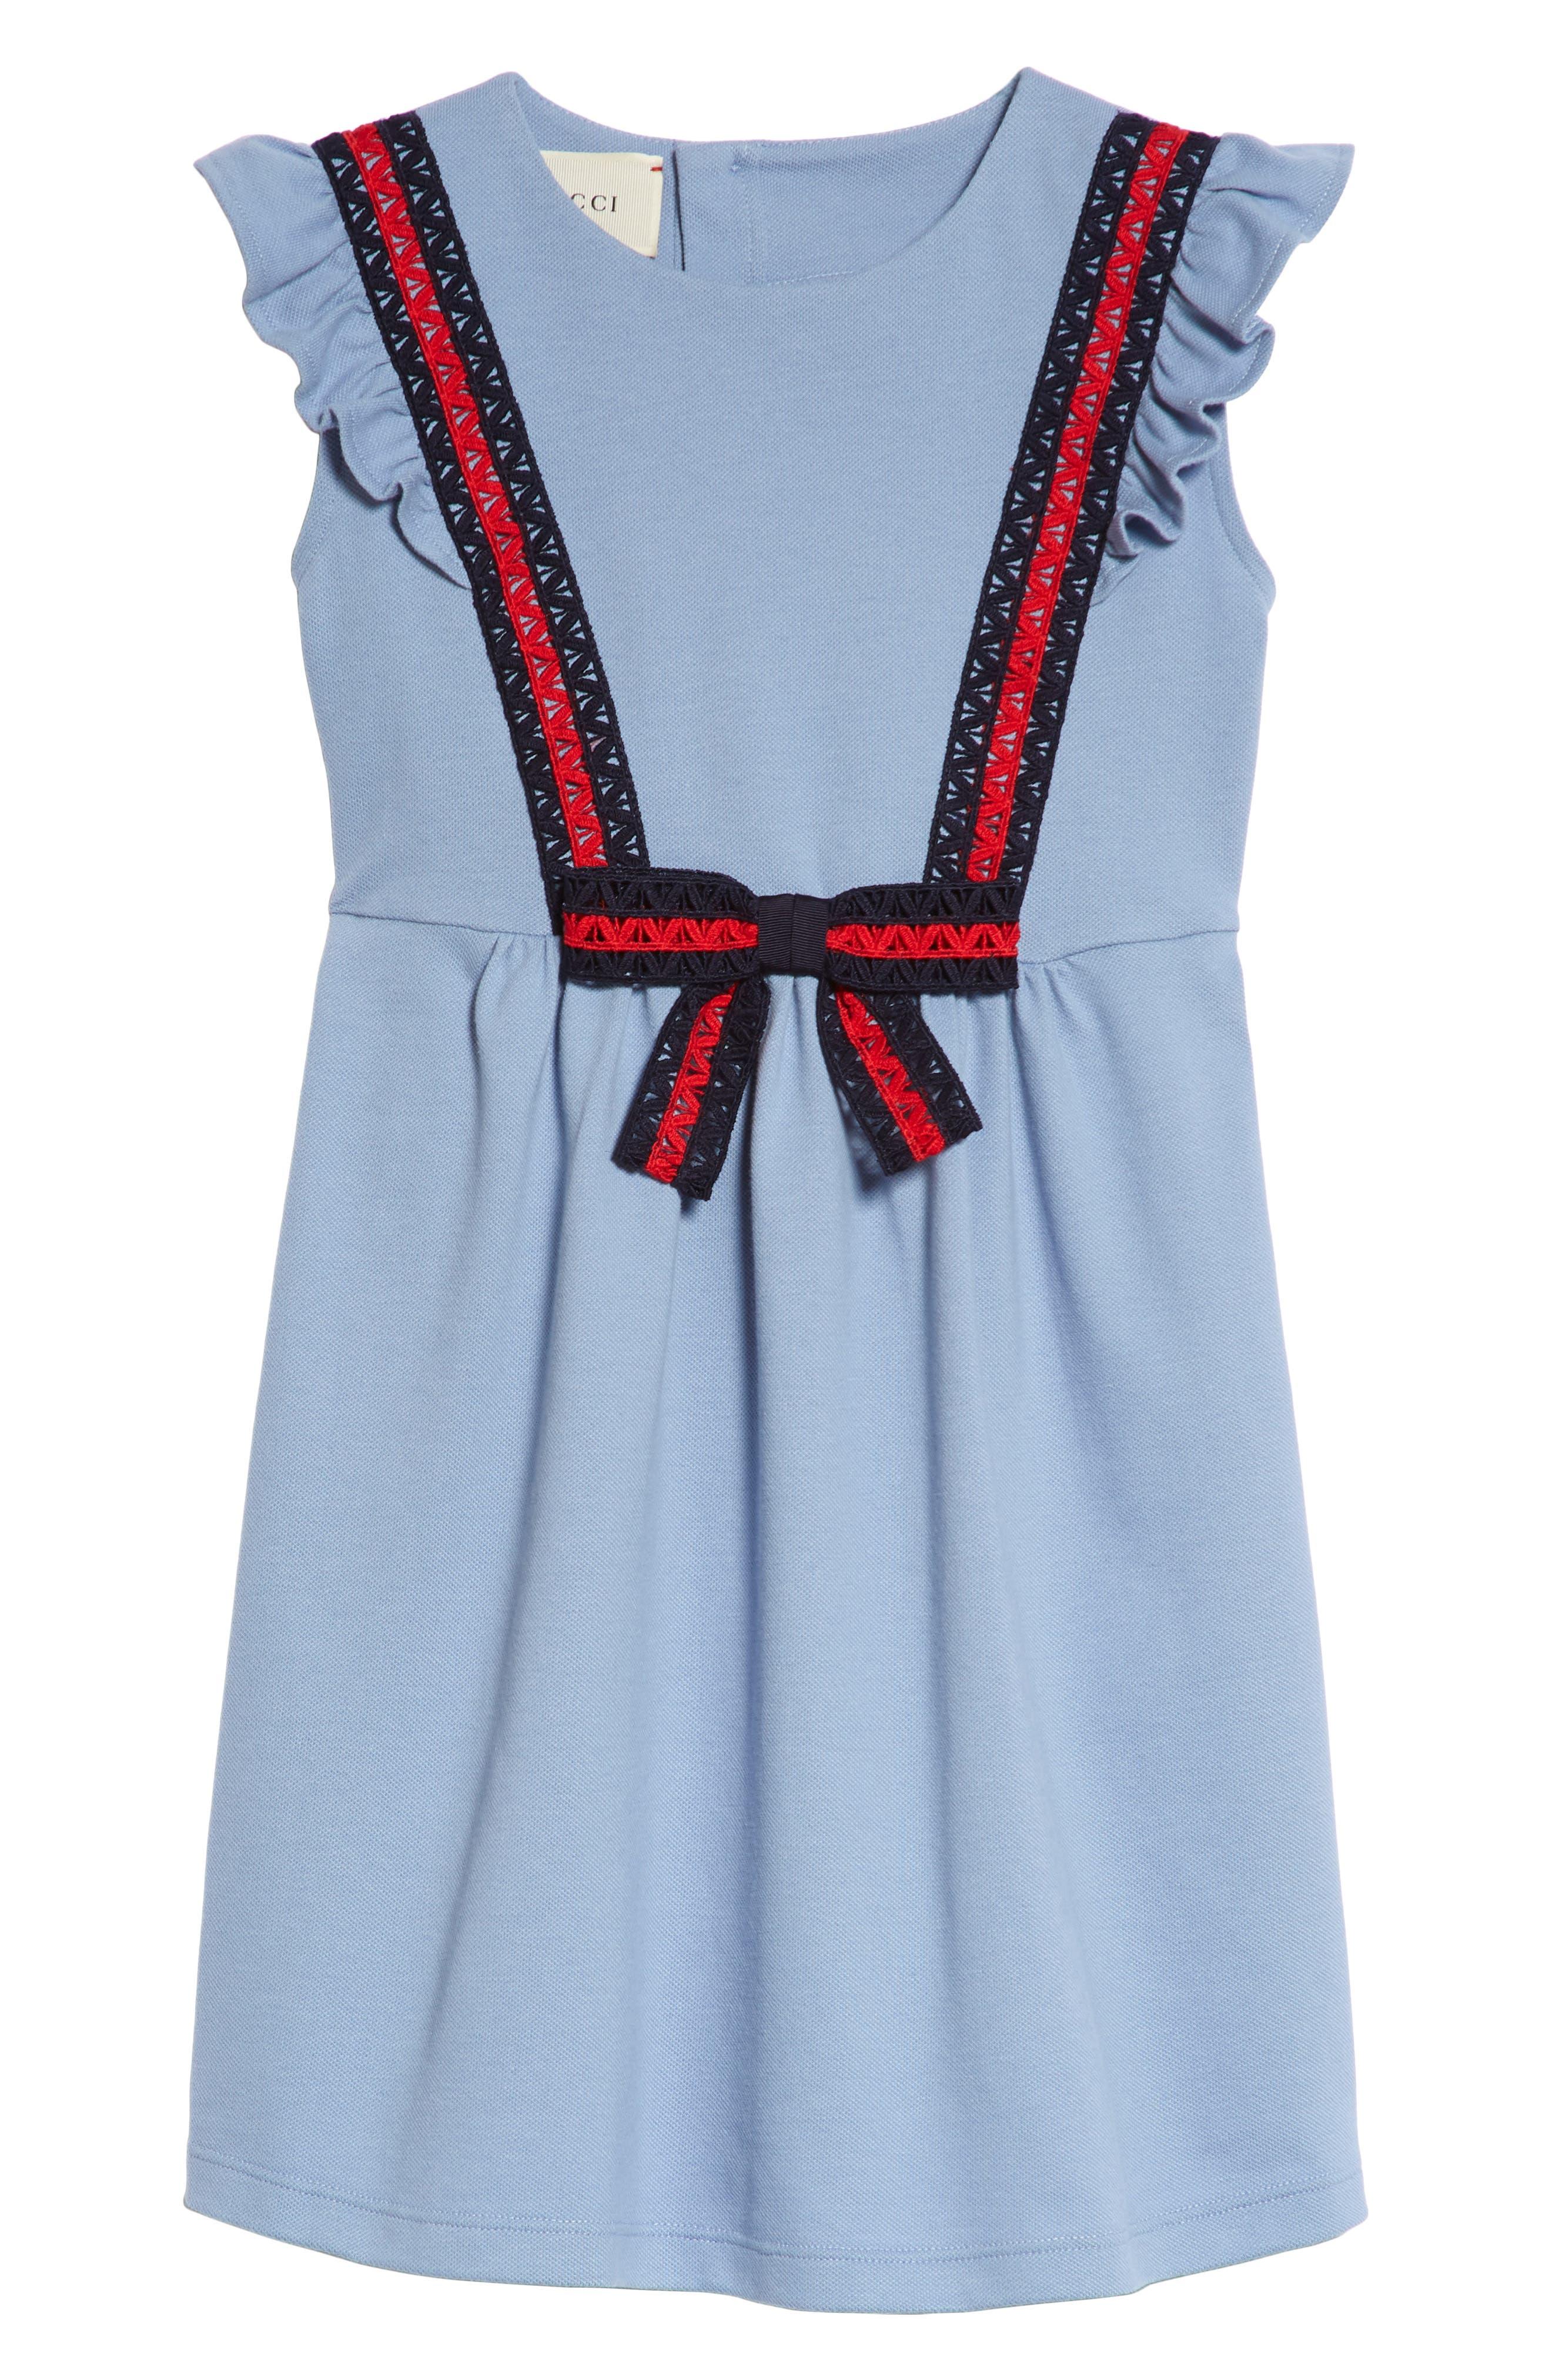 Main Image - Gucci Piqué Dress (Little Girls & Big Girls)